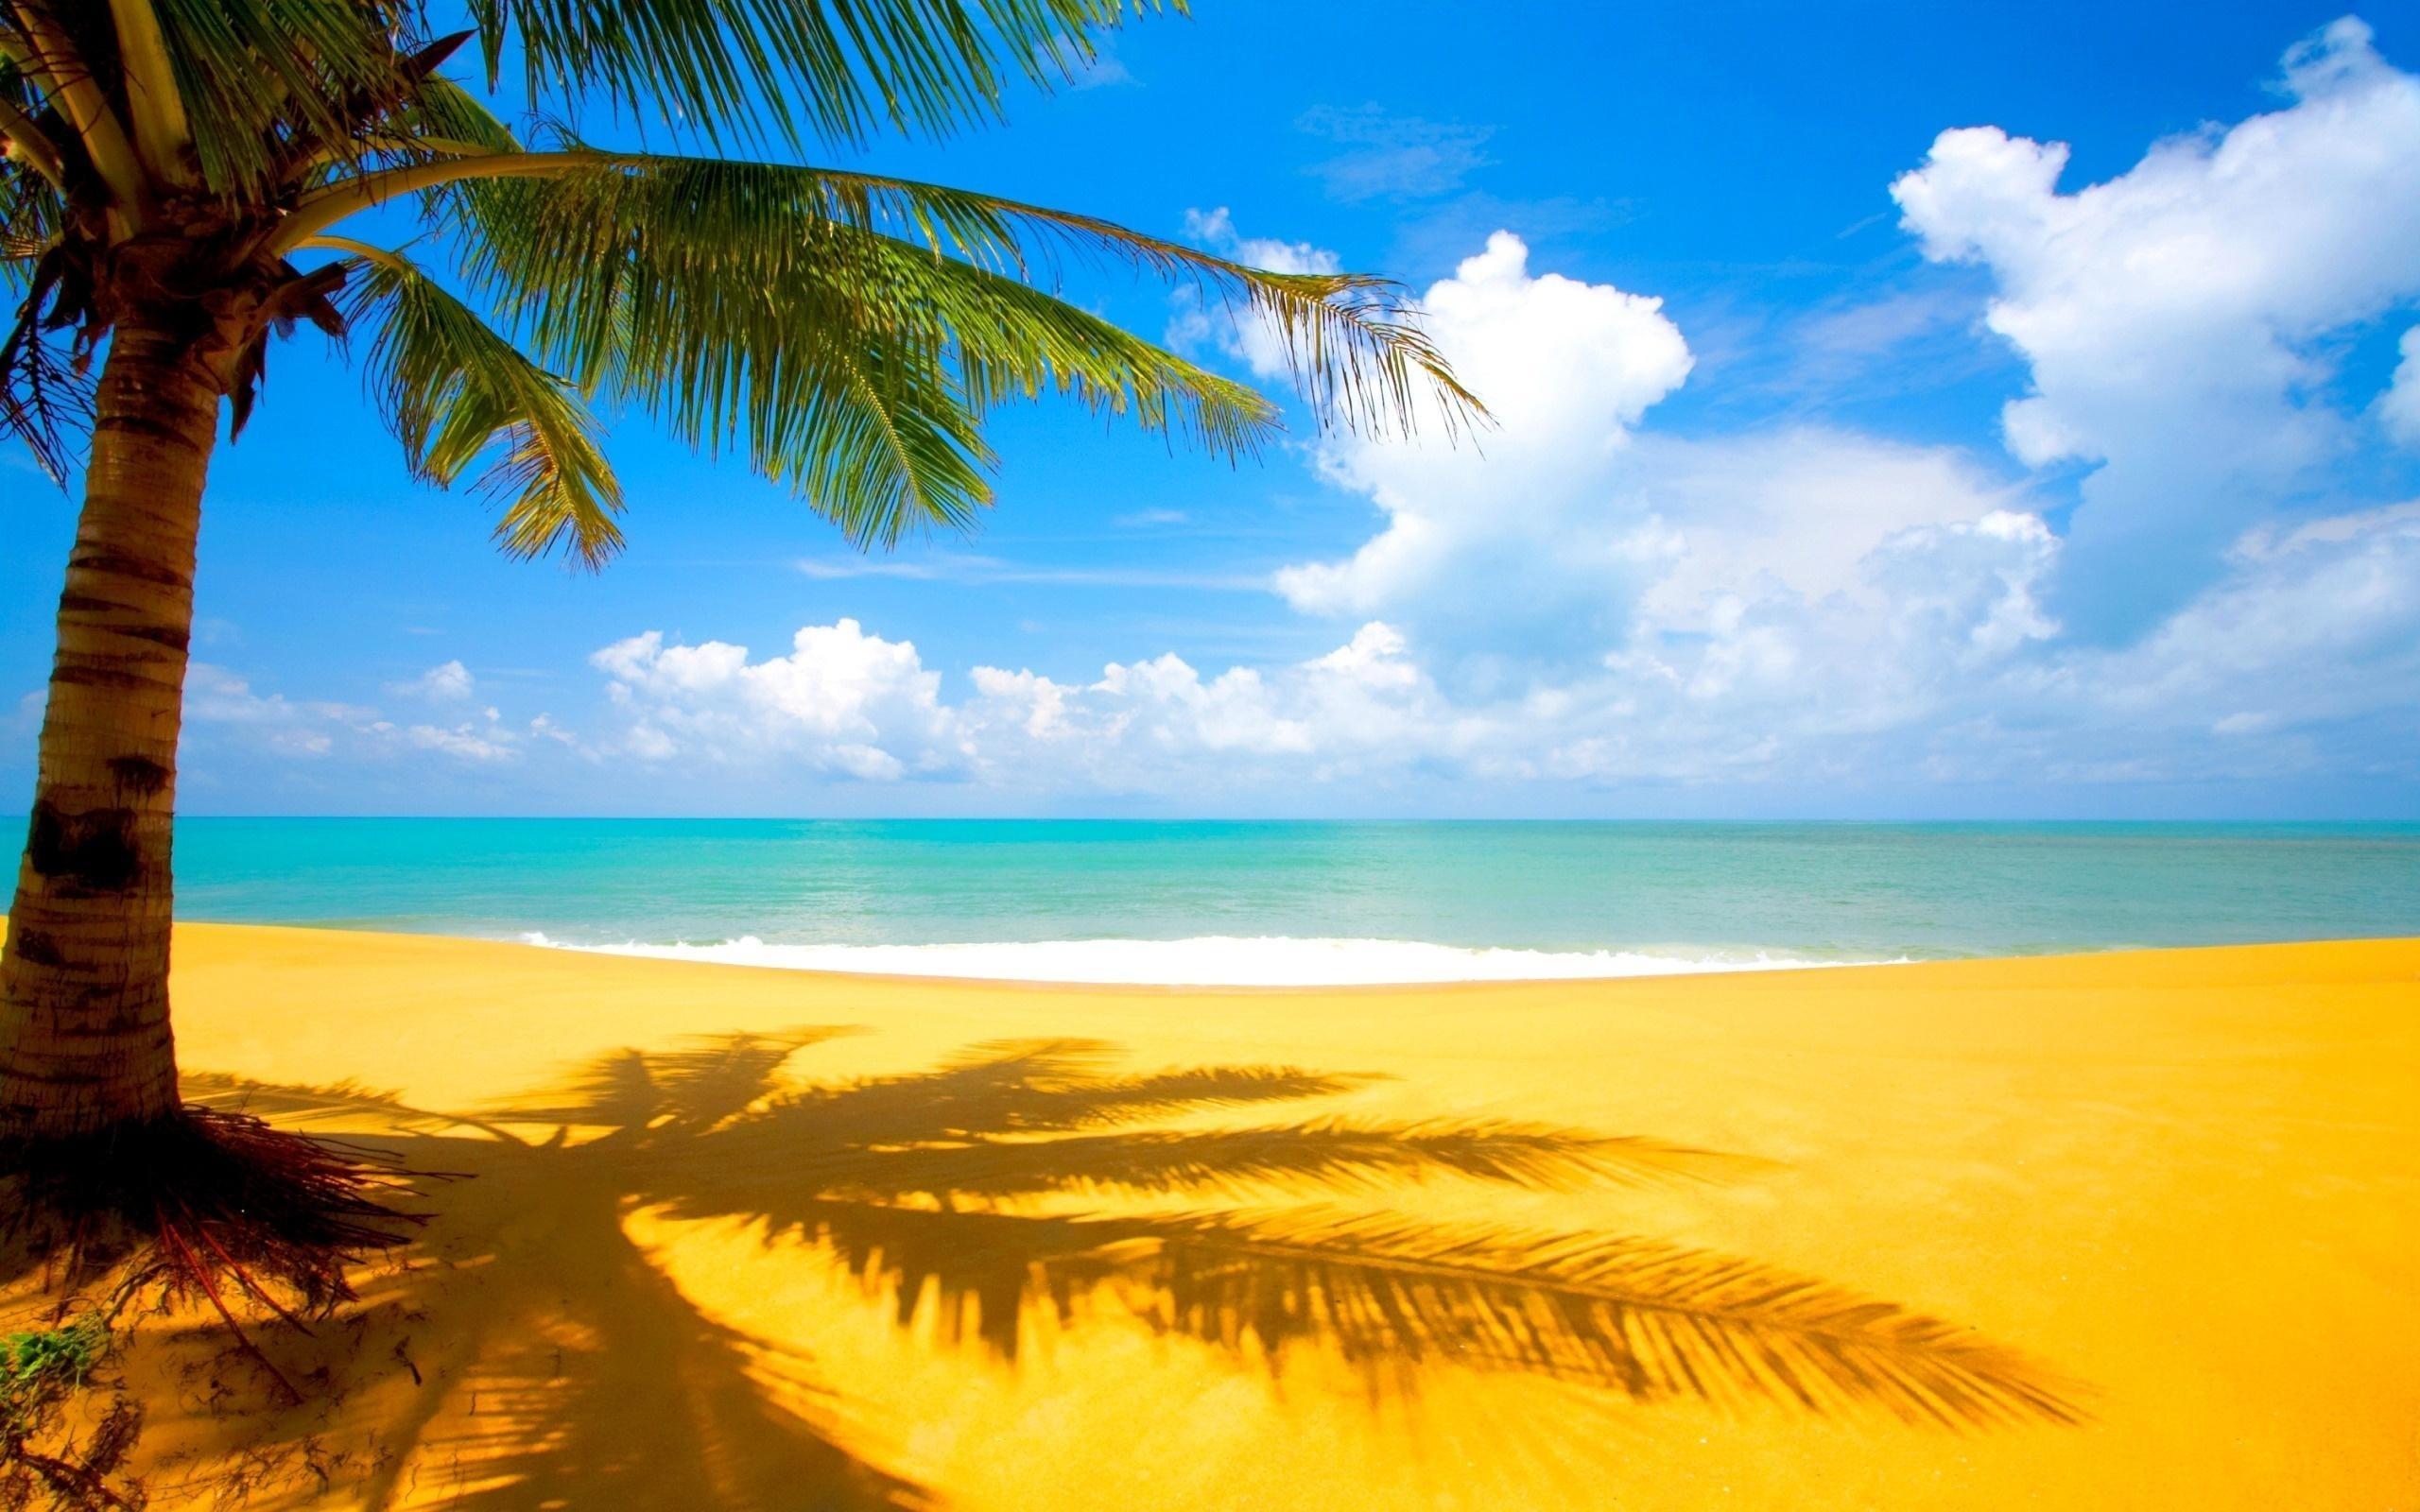 Море, солнце, пальмы